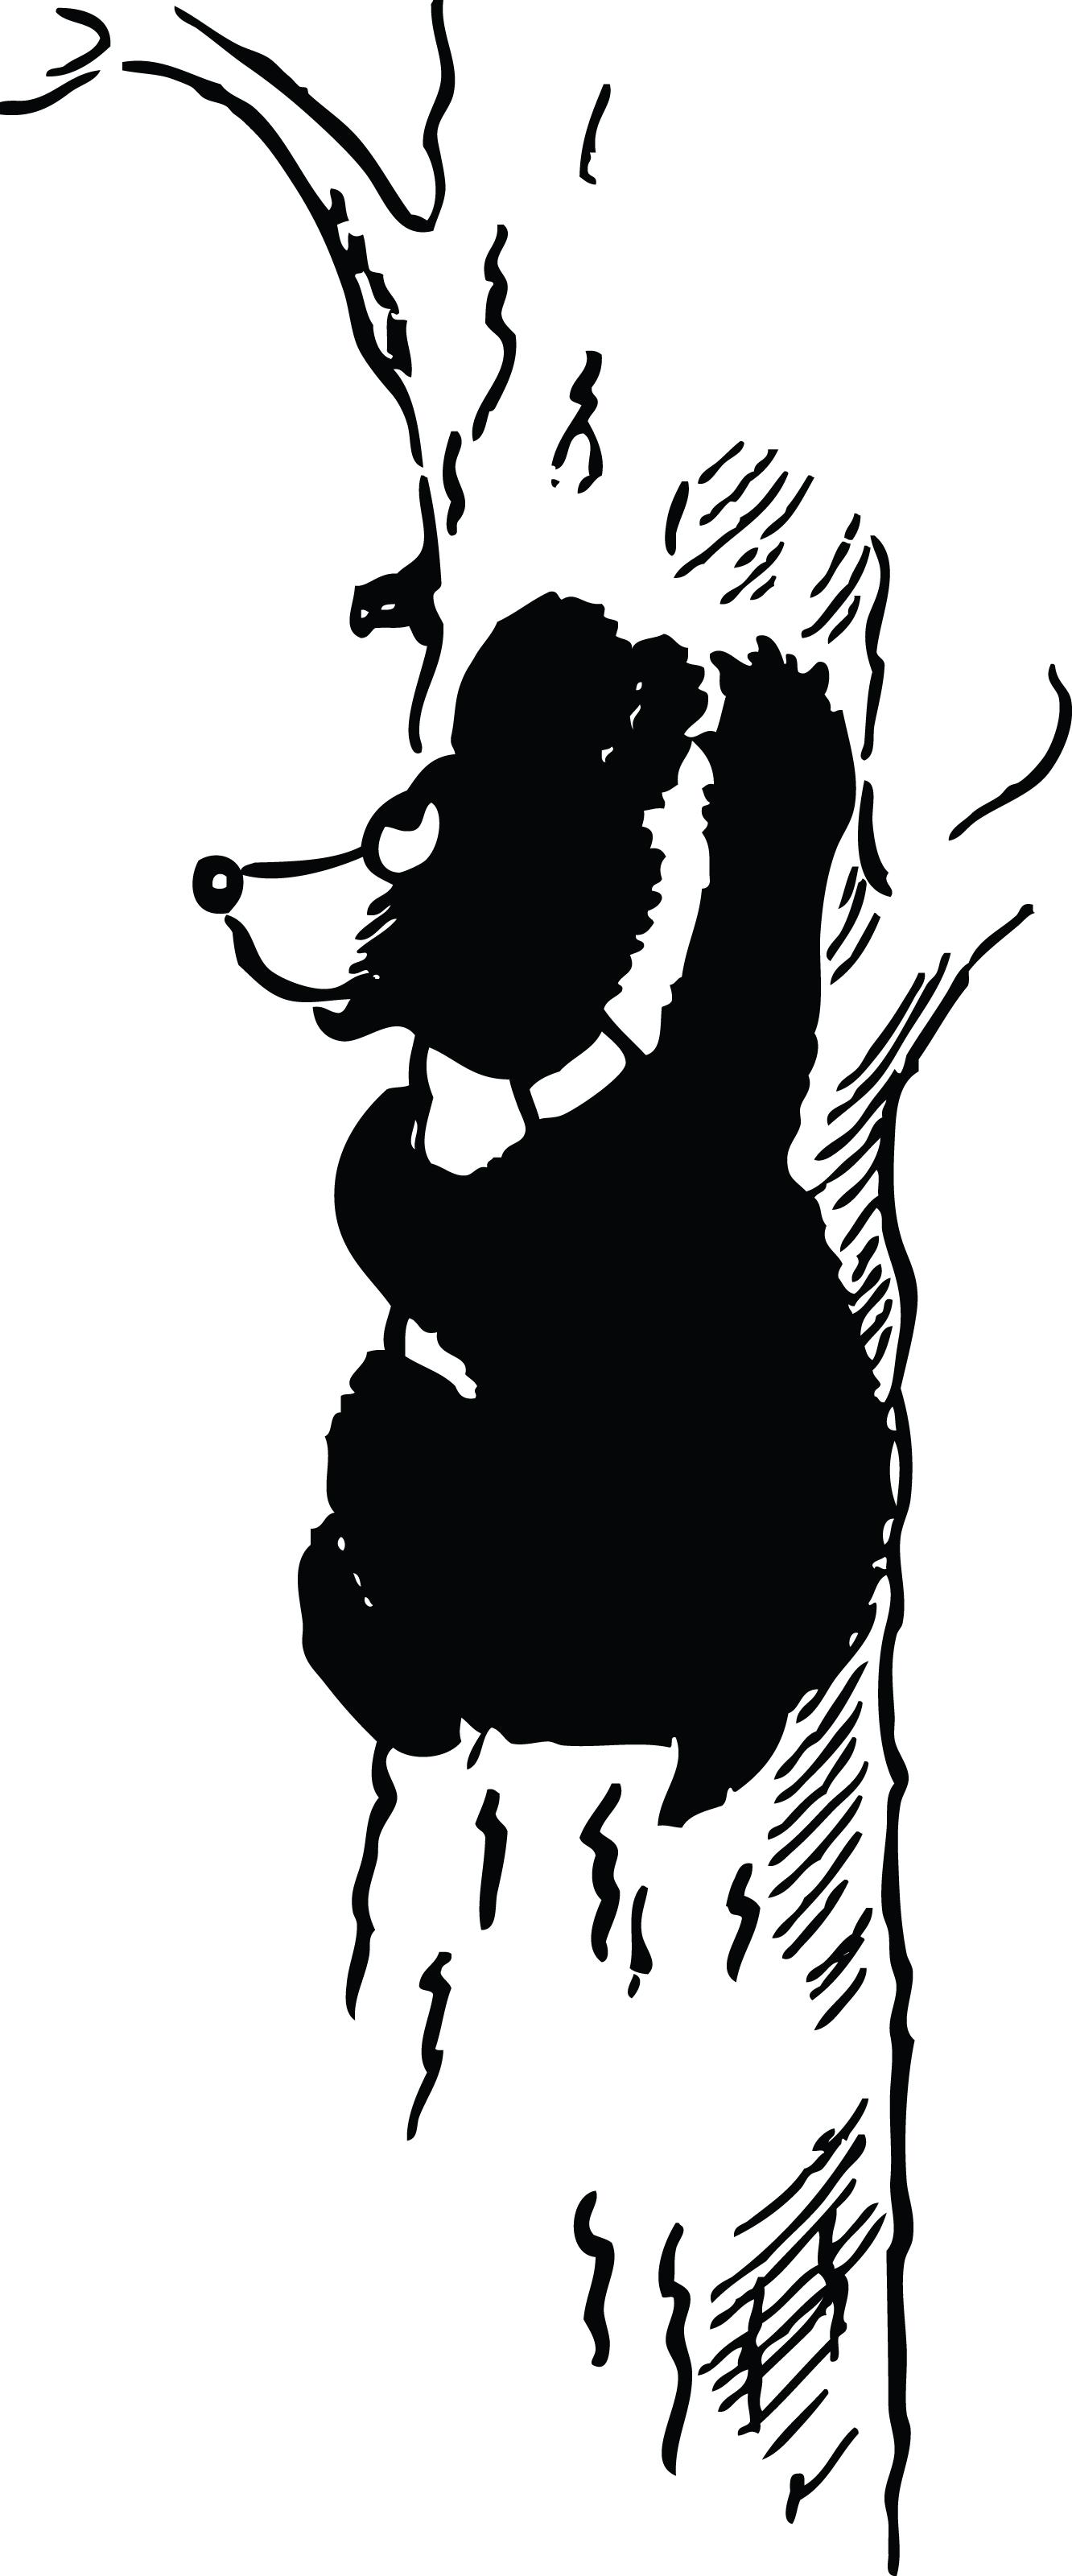 Transparent Clipart Bear Climbing Tree